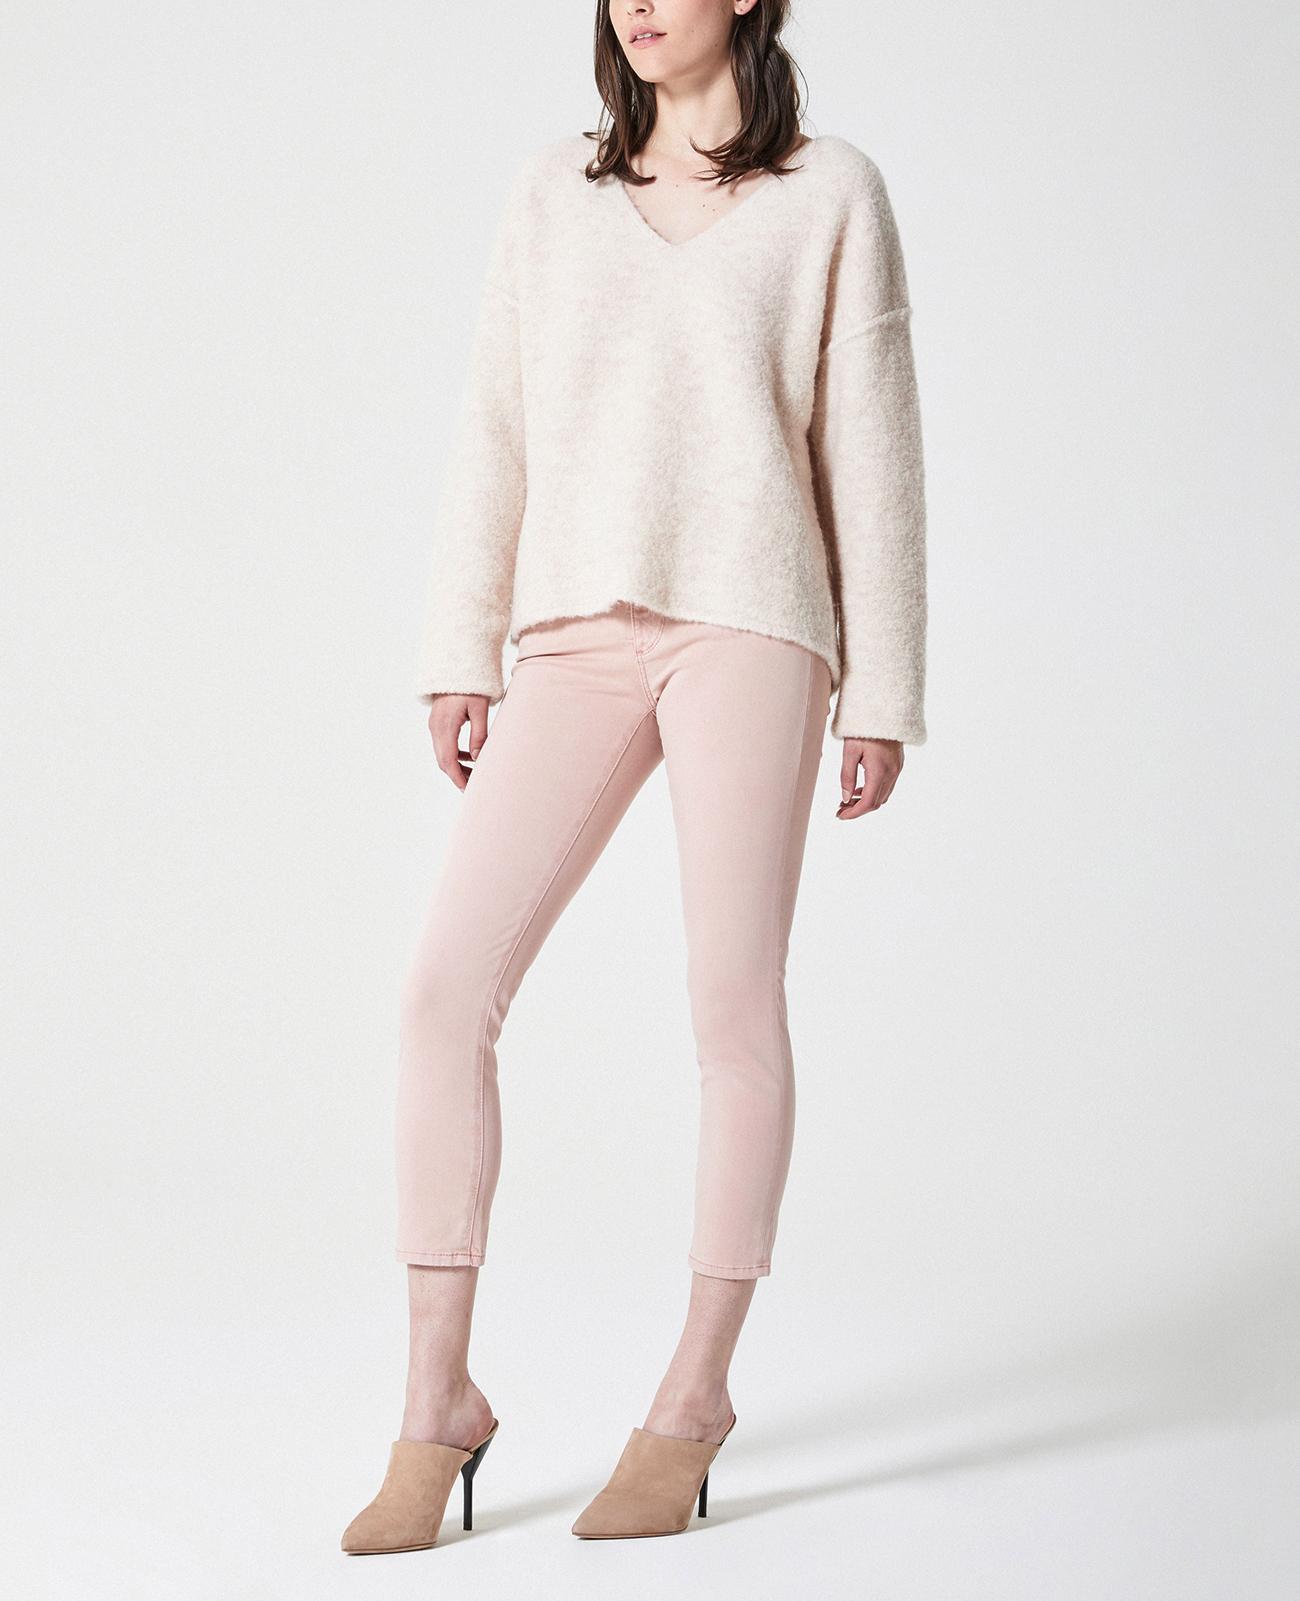 The Skye V Neck Sweater